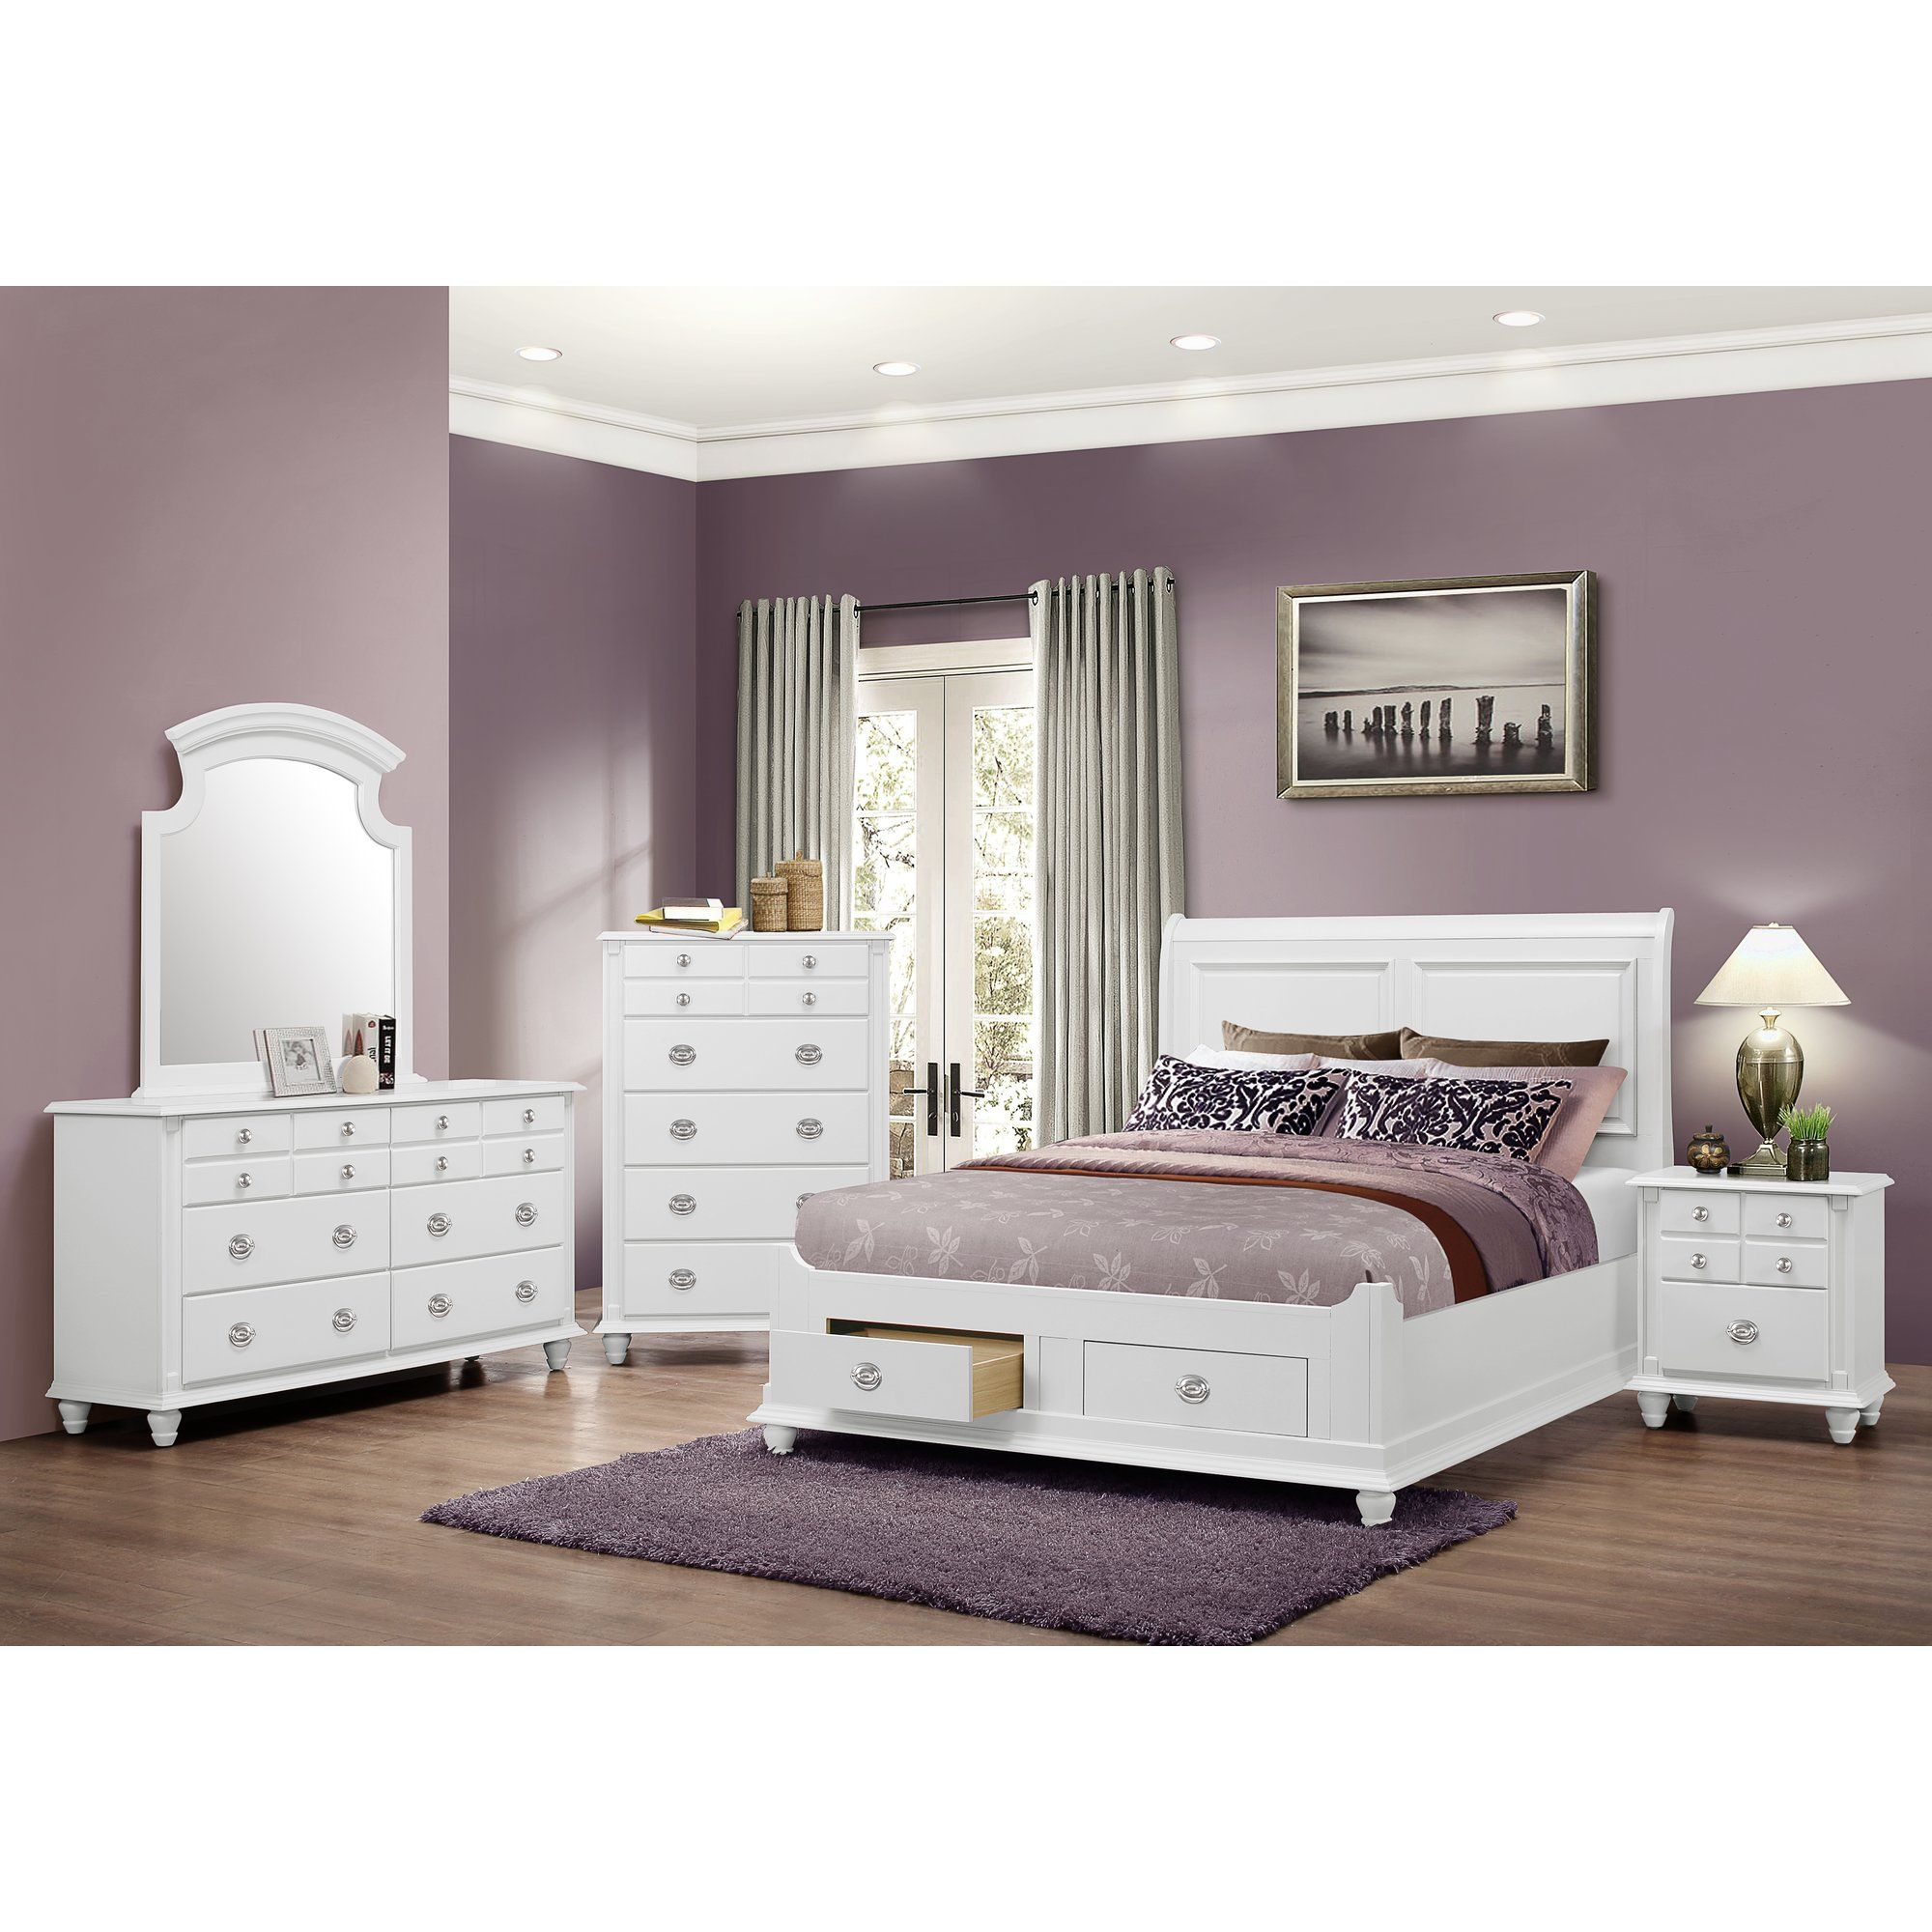 Daley Storage Panel Customizable Bedroom Set Bedroom